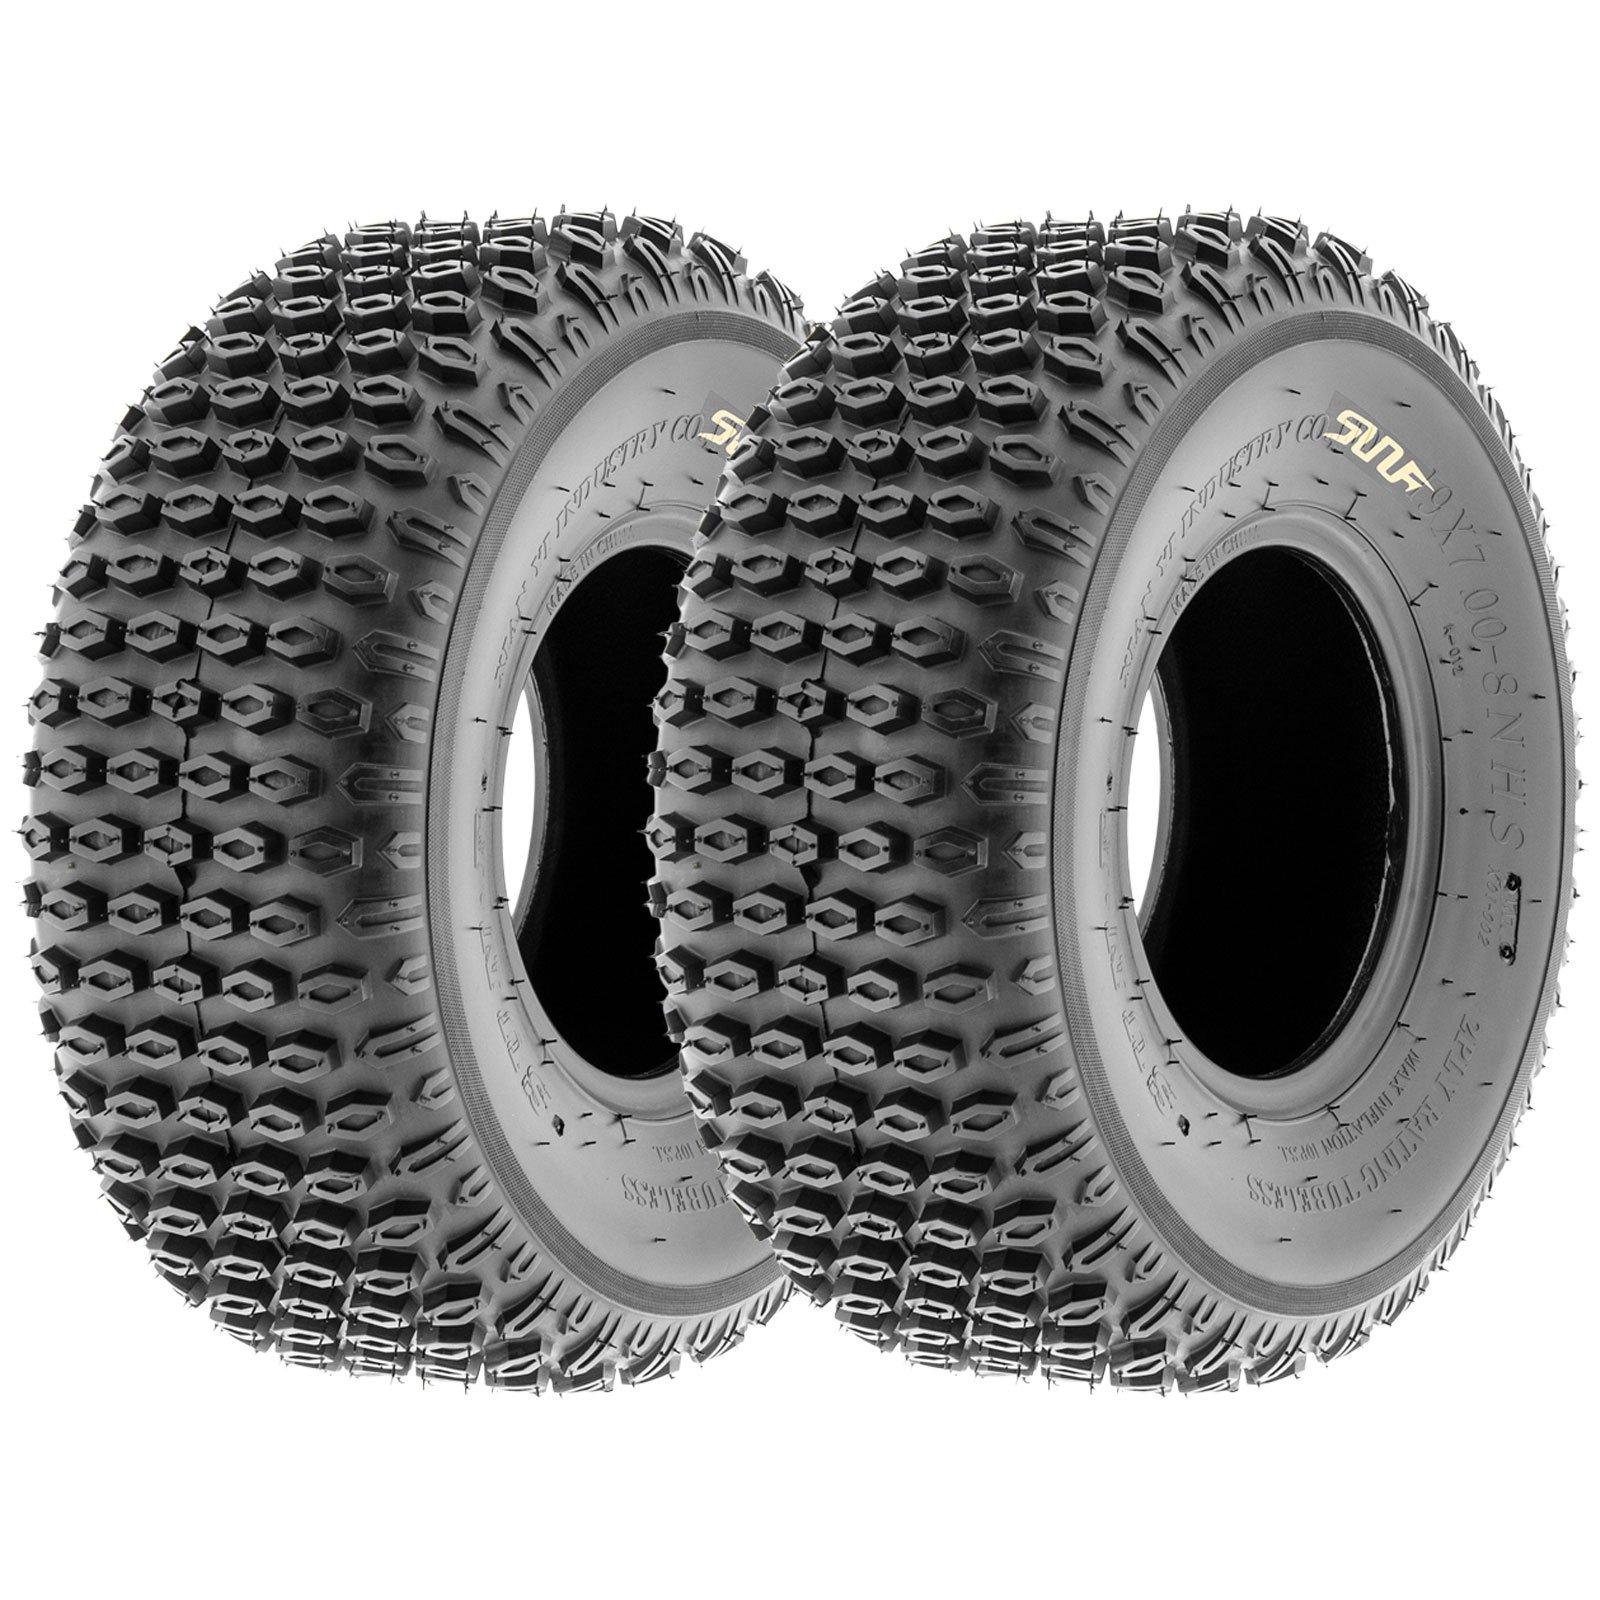 Set of 2 SunF A012 XC Sport-Racing ATV/UTV Off-Road Tires 19x7-8, 6PR, Knobby Tread